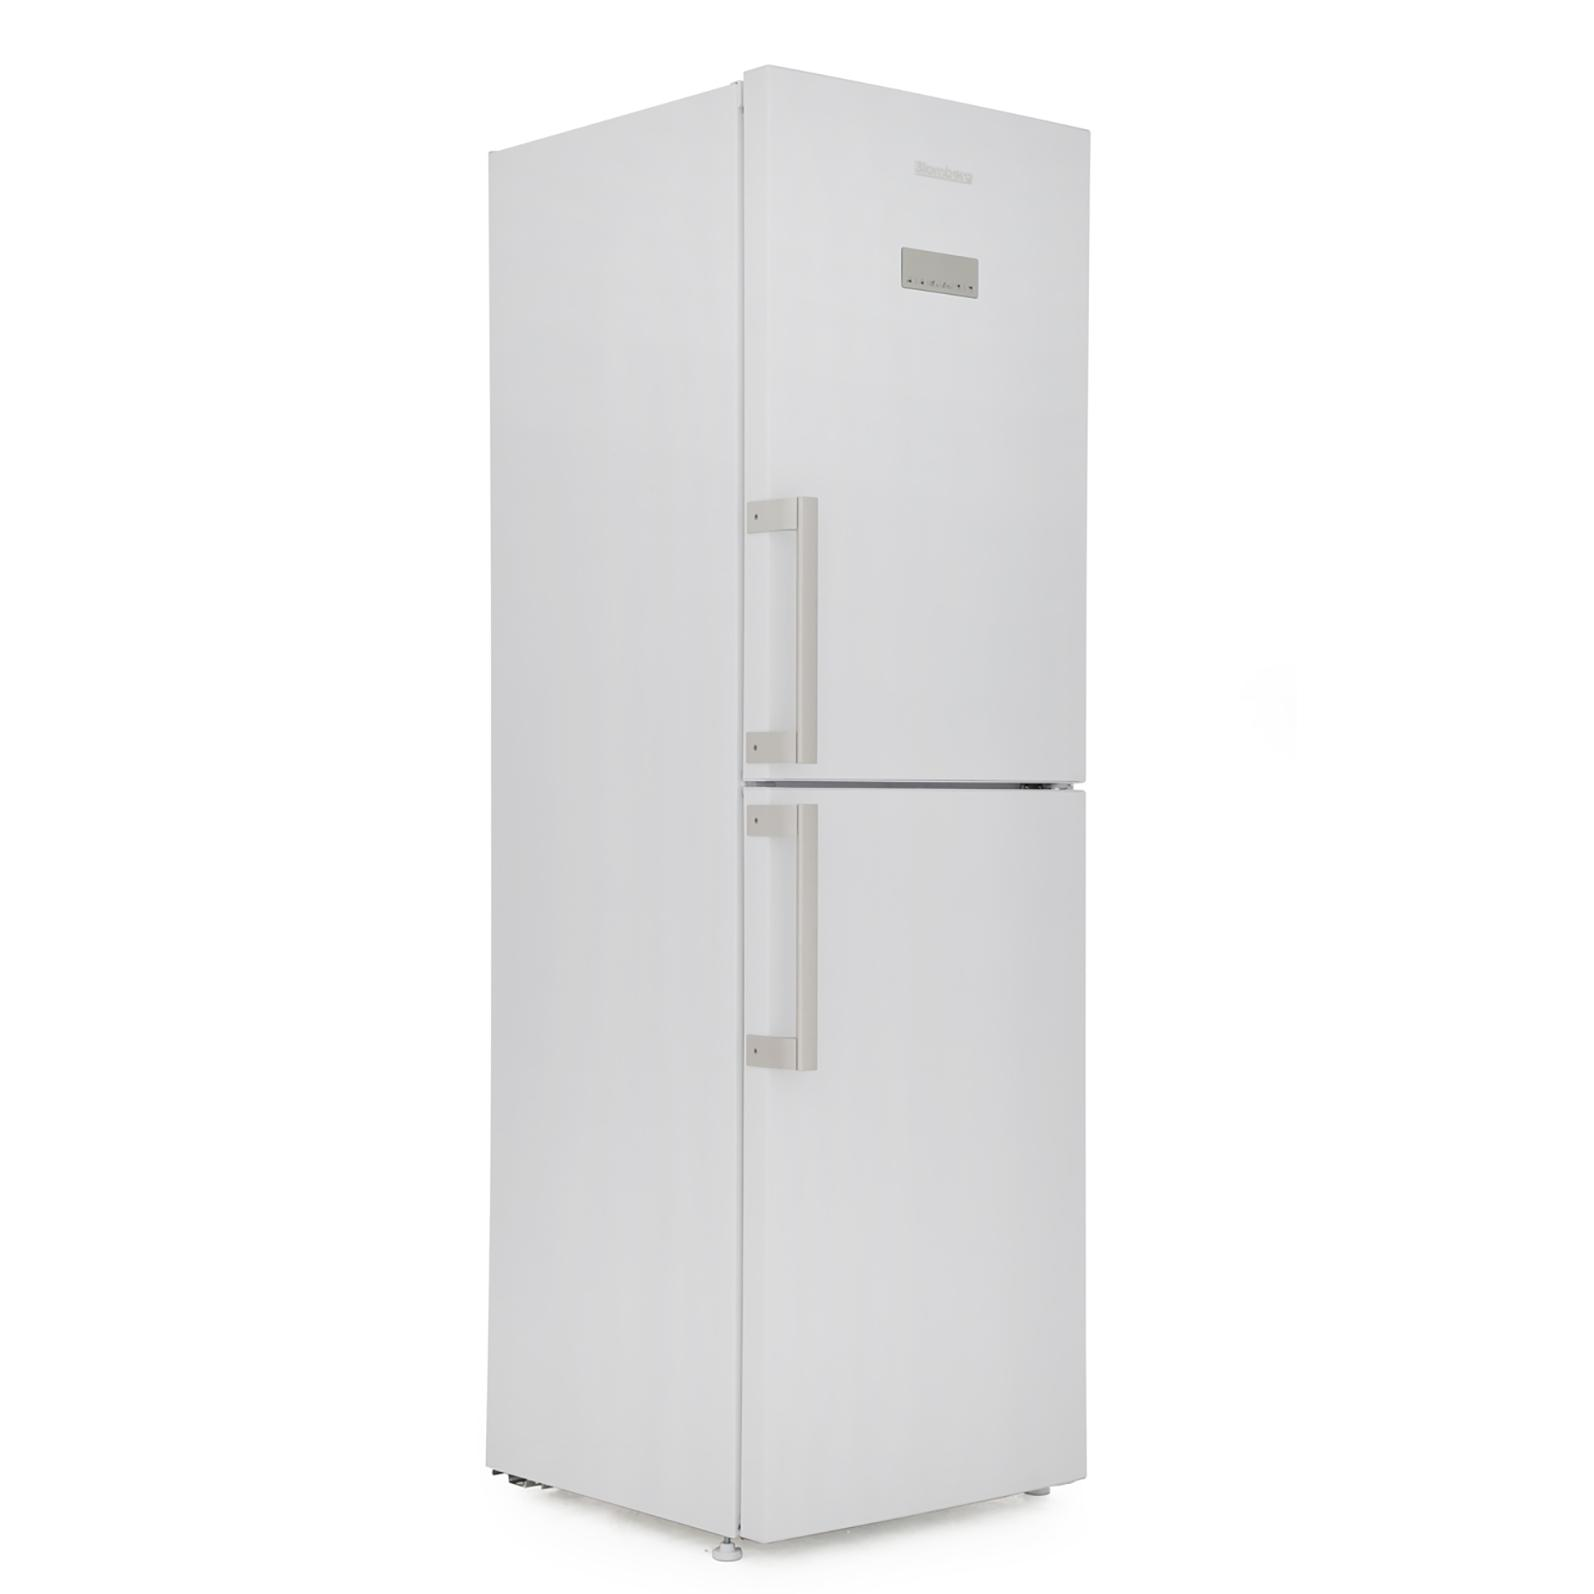 Blomberg KND4682LW Frost Free Fridge Freezer